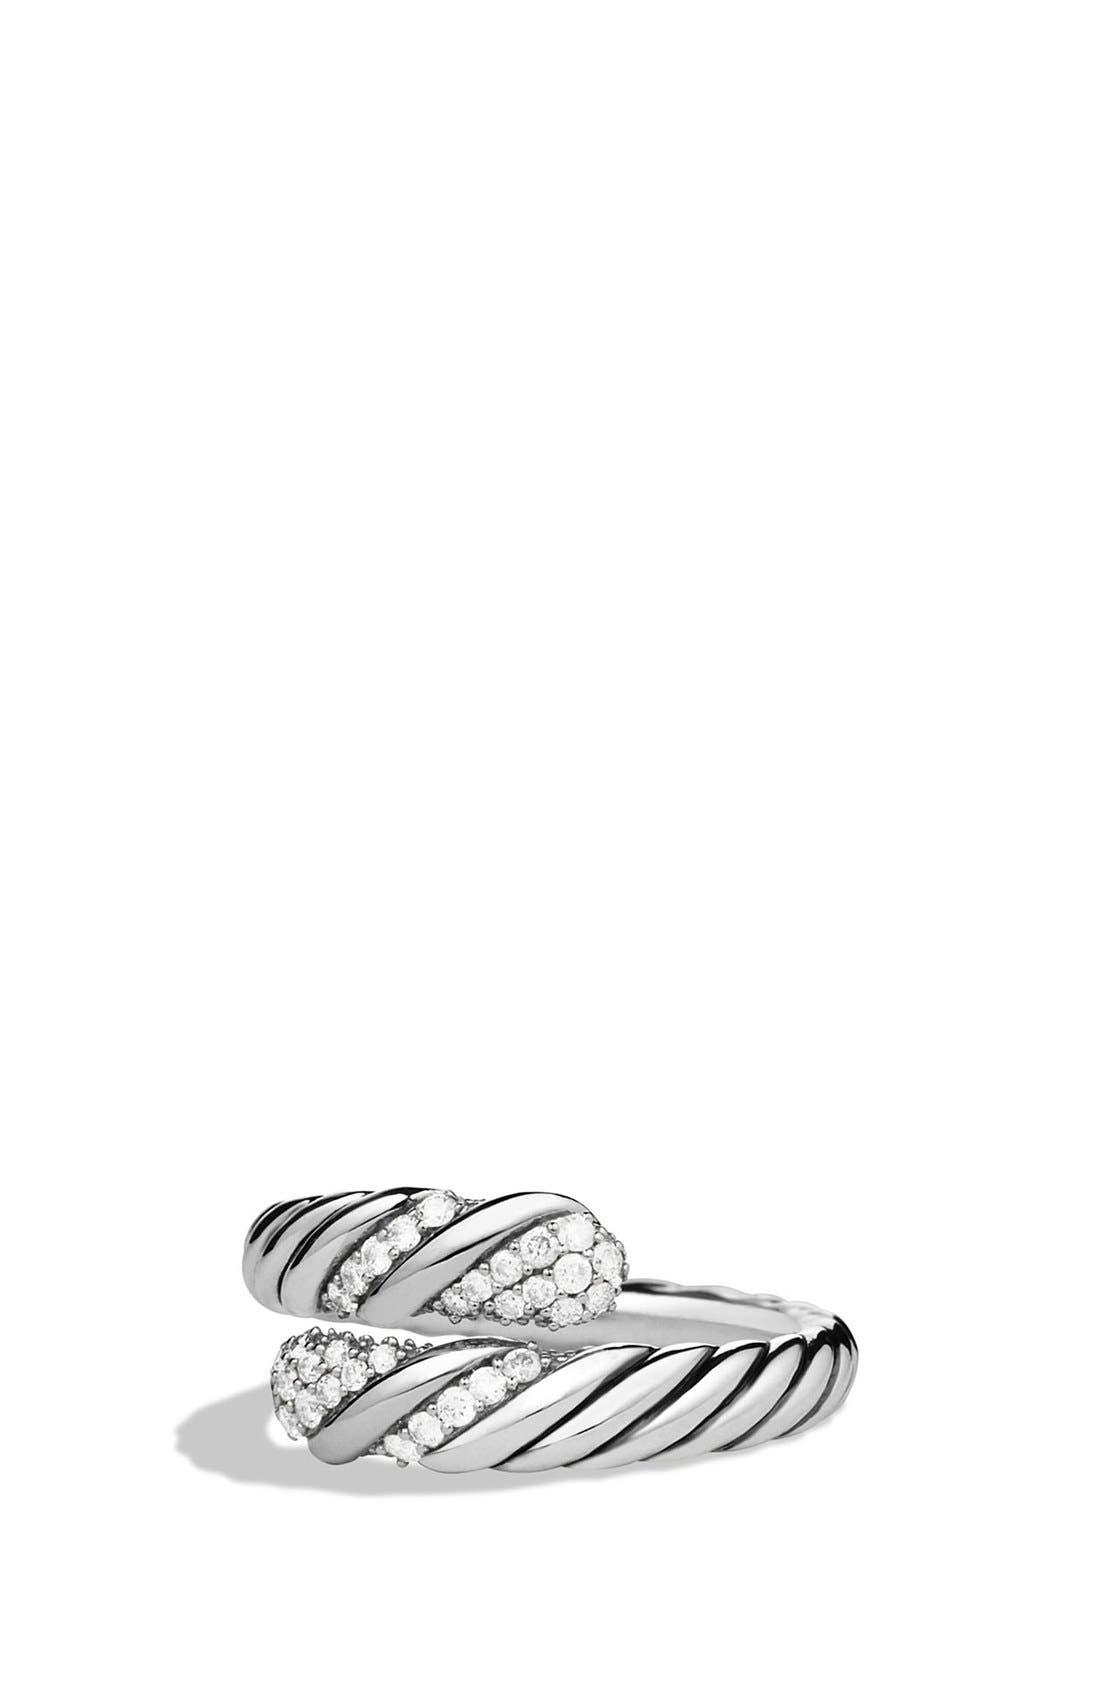 Alternate Image 1 Selected - David Yurman 'Willow' Open Single Row Ring with Diamonds